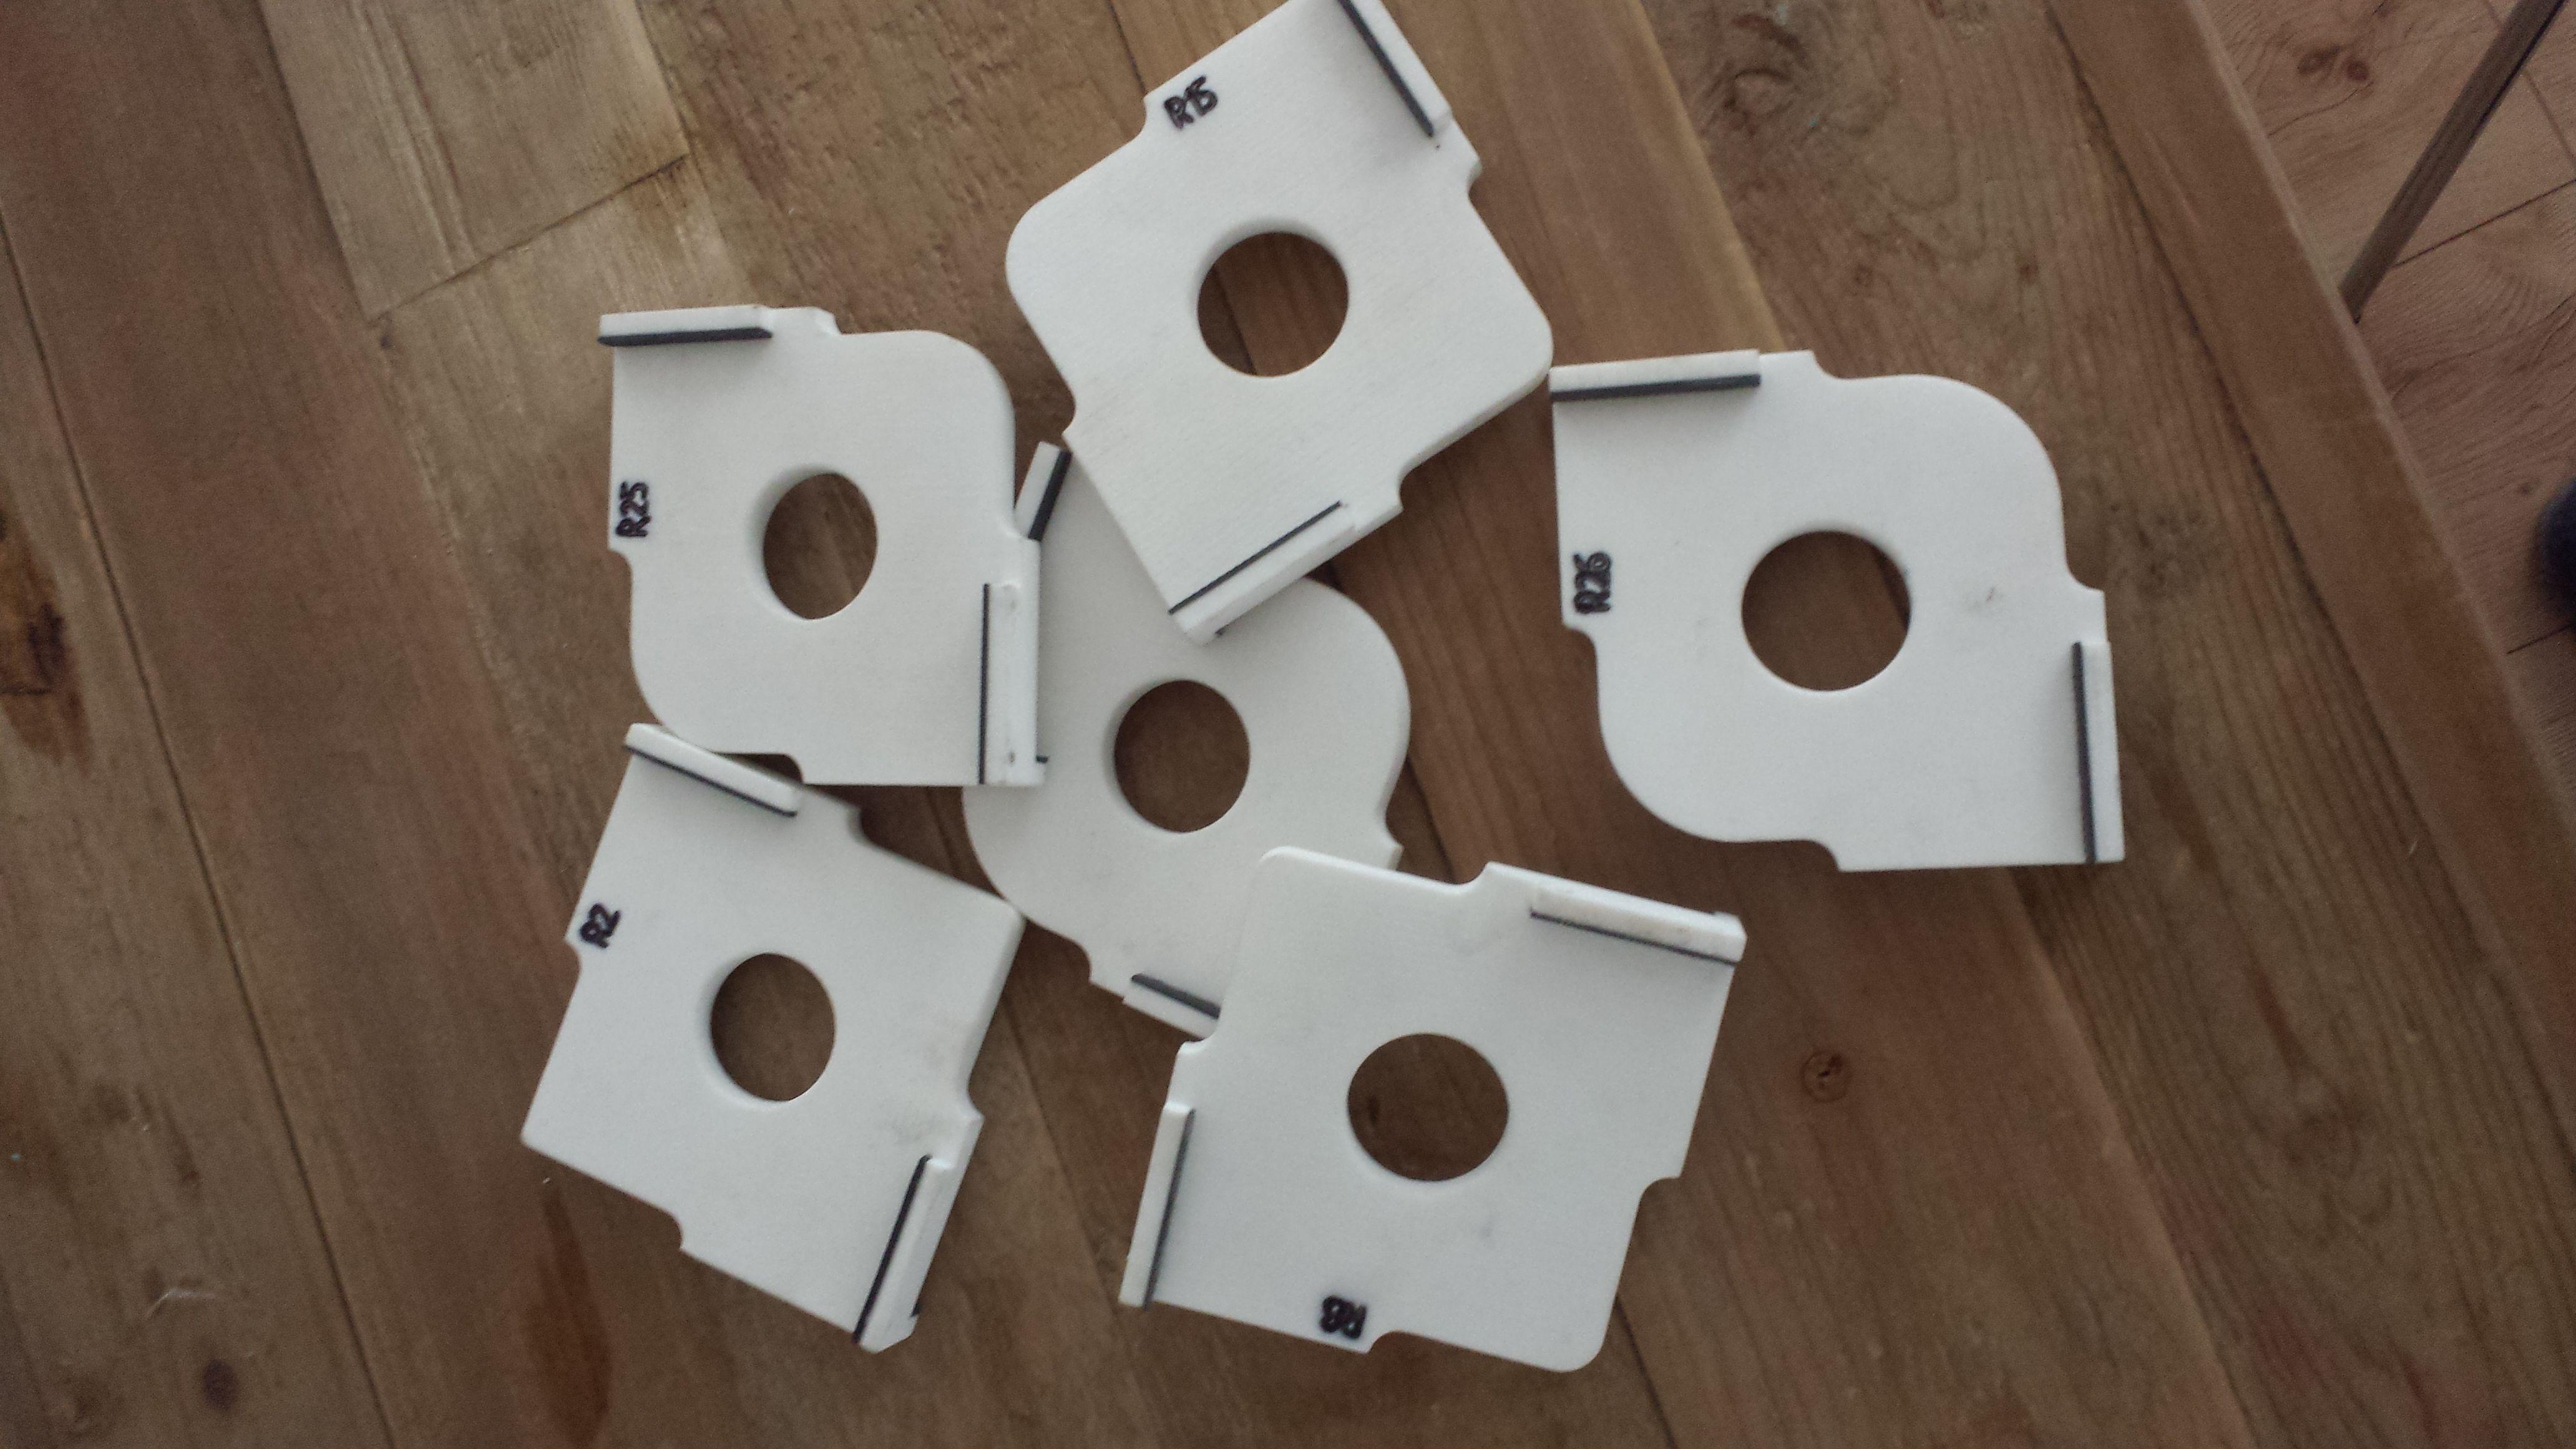 radiusschablonen f r den fr stisch bauanleitung zum selber bauen woodworking jigs pinterest. Black Bedroom Furniture Sets. Home Design Ideas